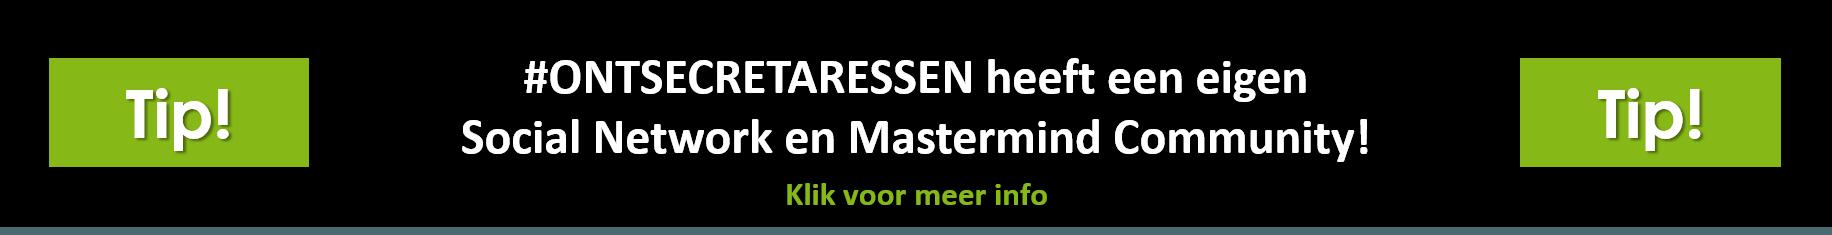 banner mastermind community